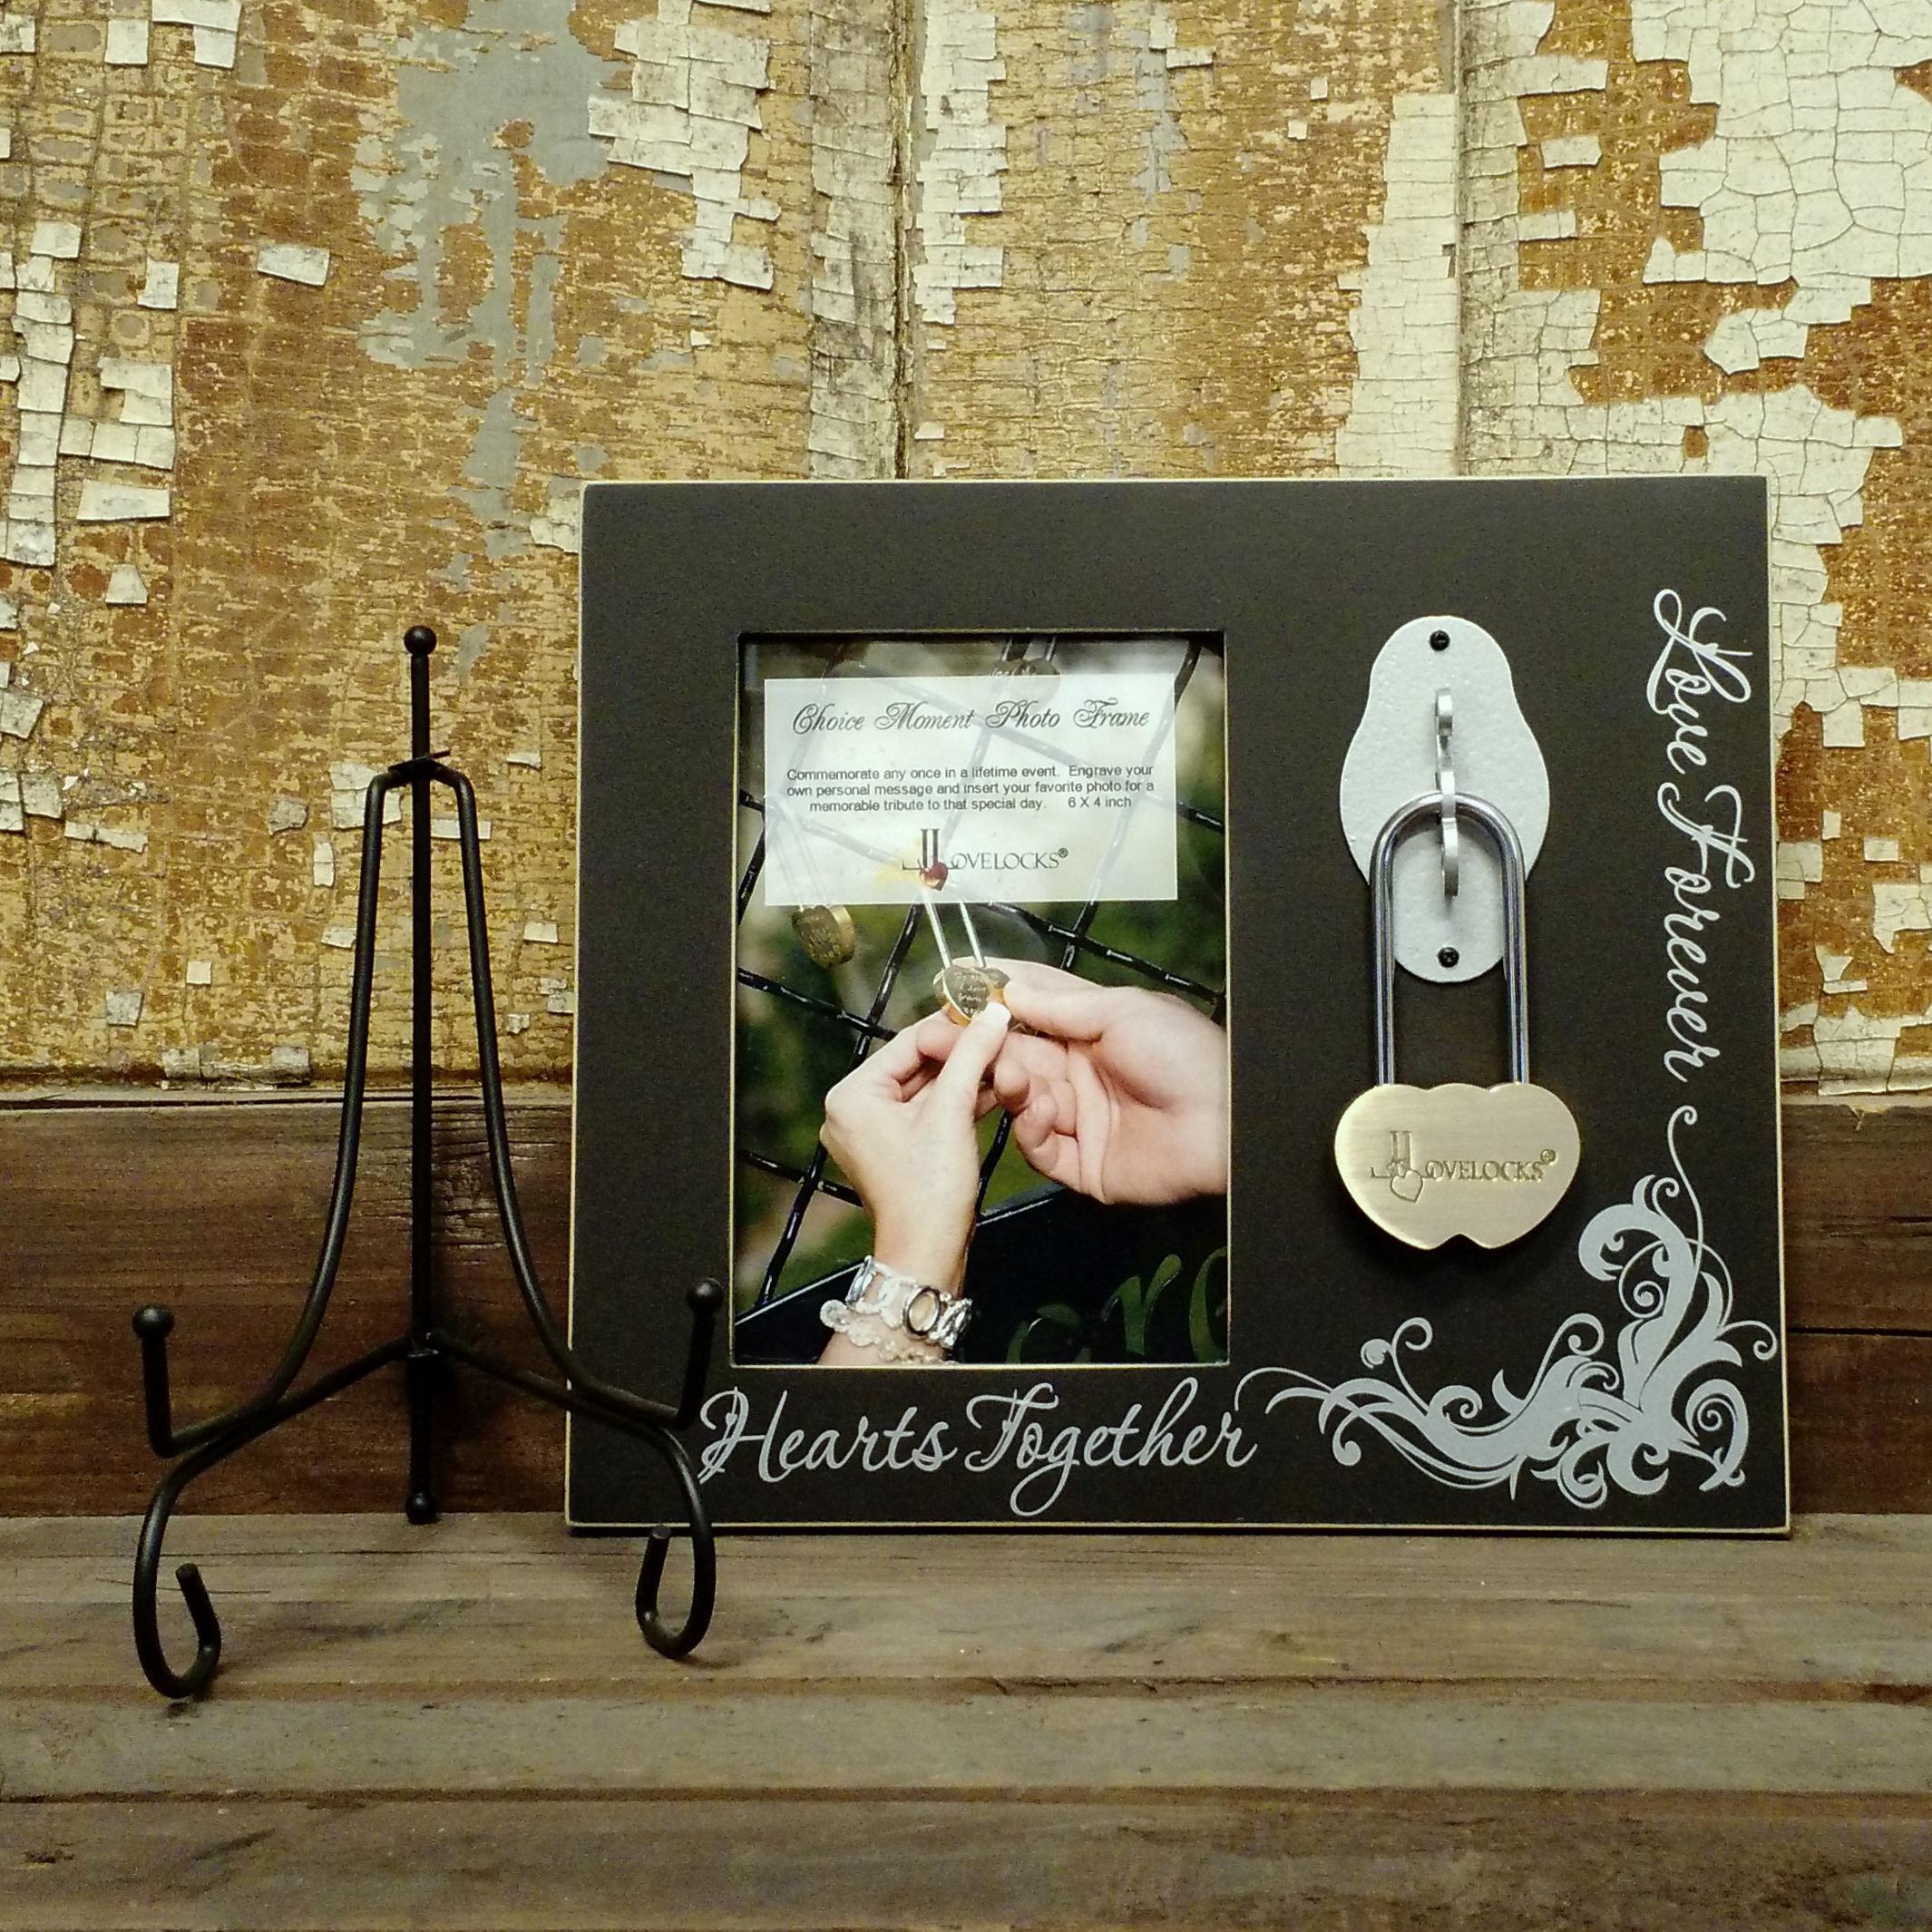 LoveLocks® Choice Moment Photo Frame – Lovelocks